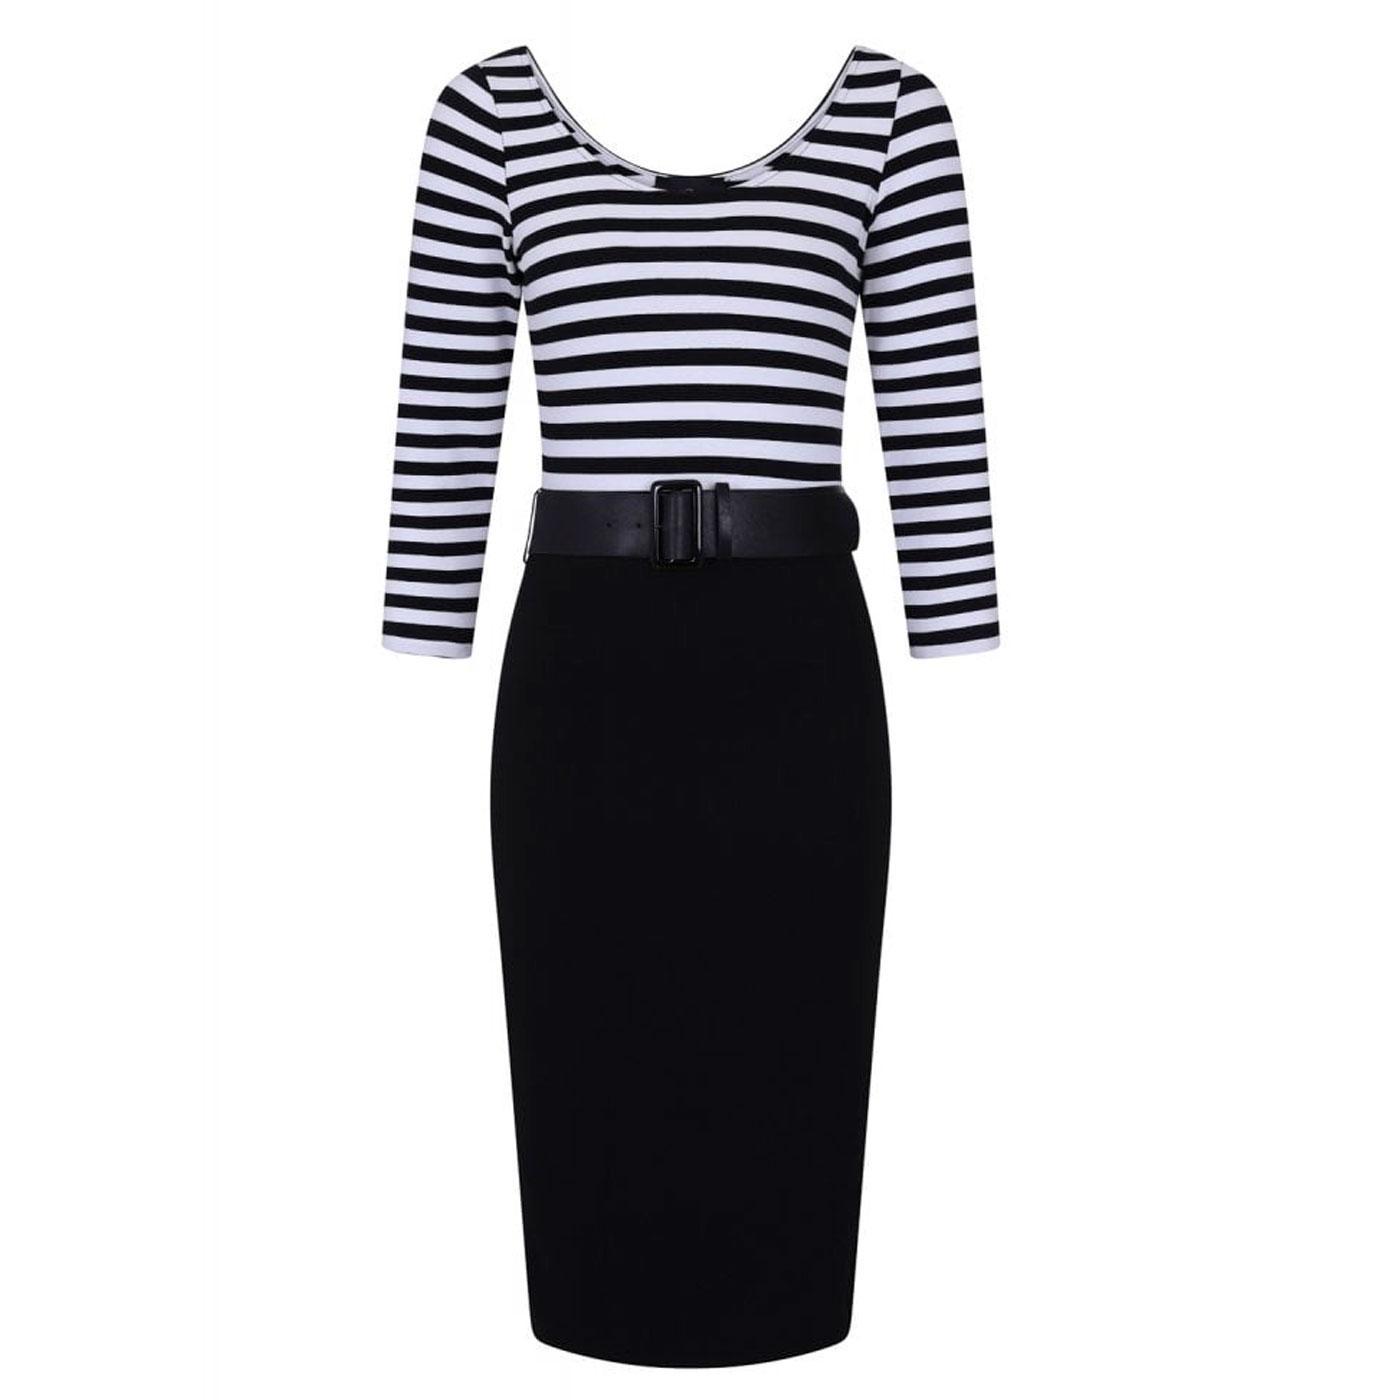 Manuela COLLECTIF Striped Pencil Dress BLACK/WHITE